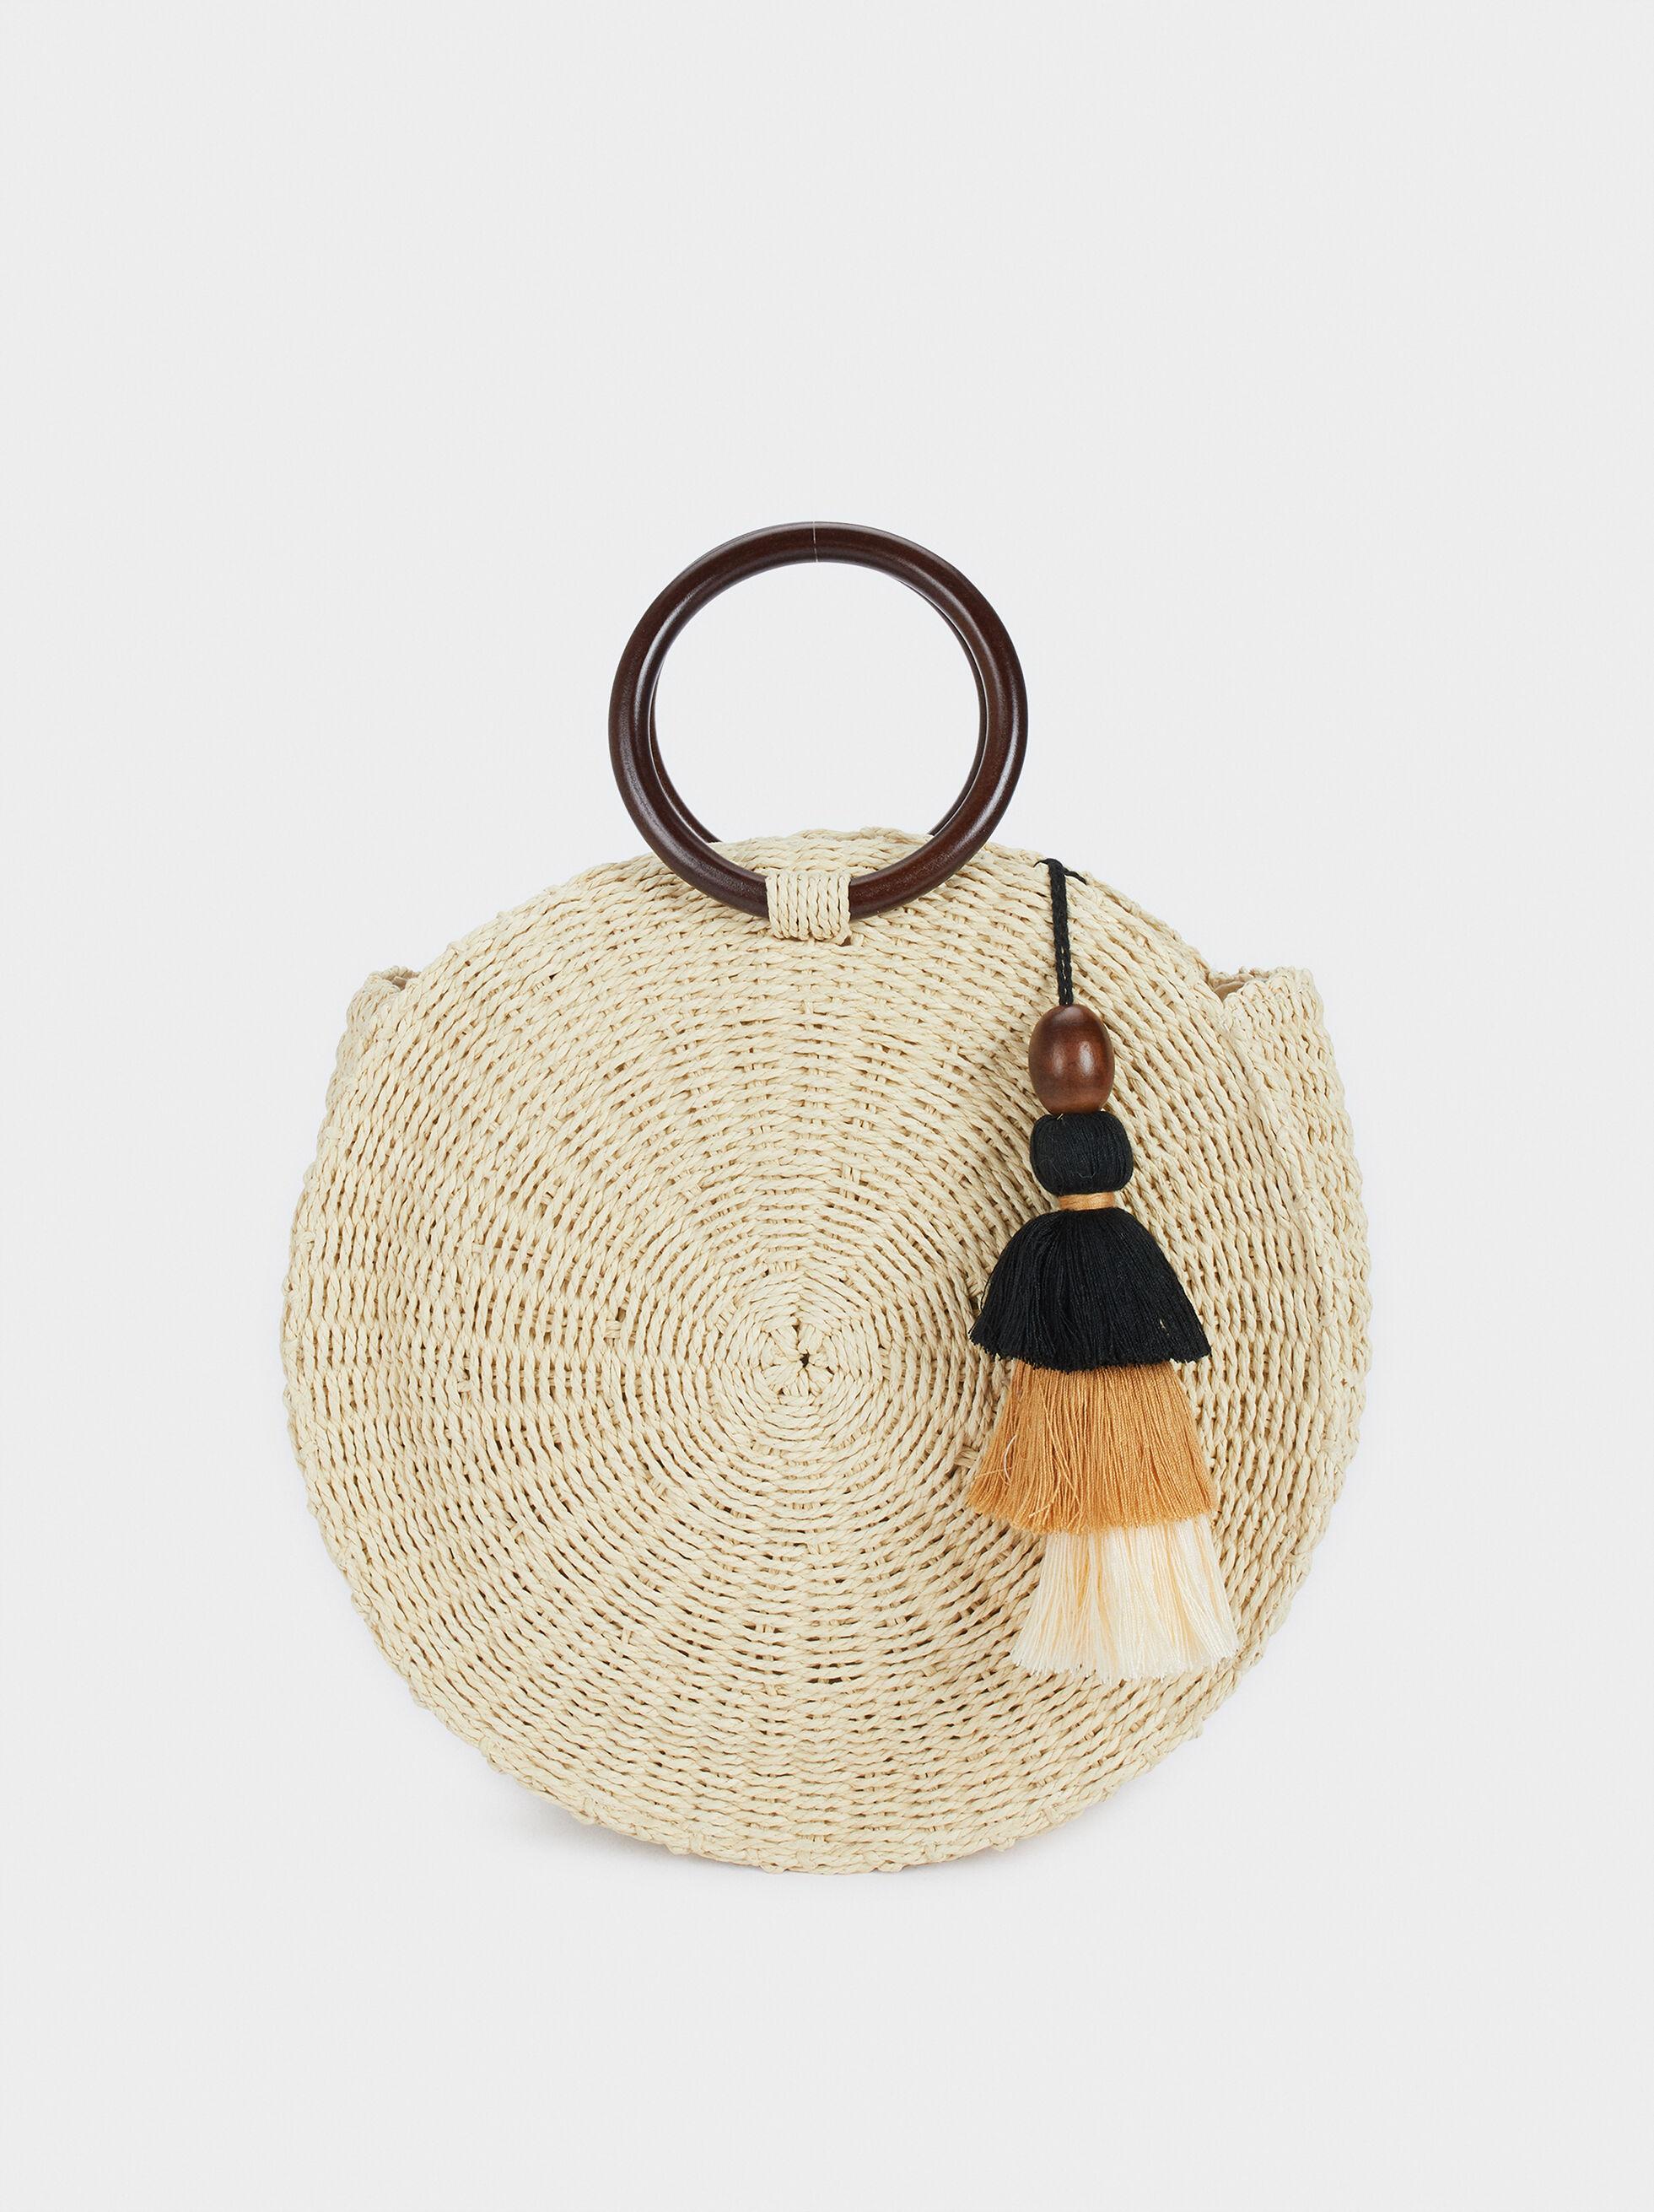 Round Textured Raffia Tote Bag, Beige, hi-res